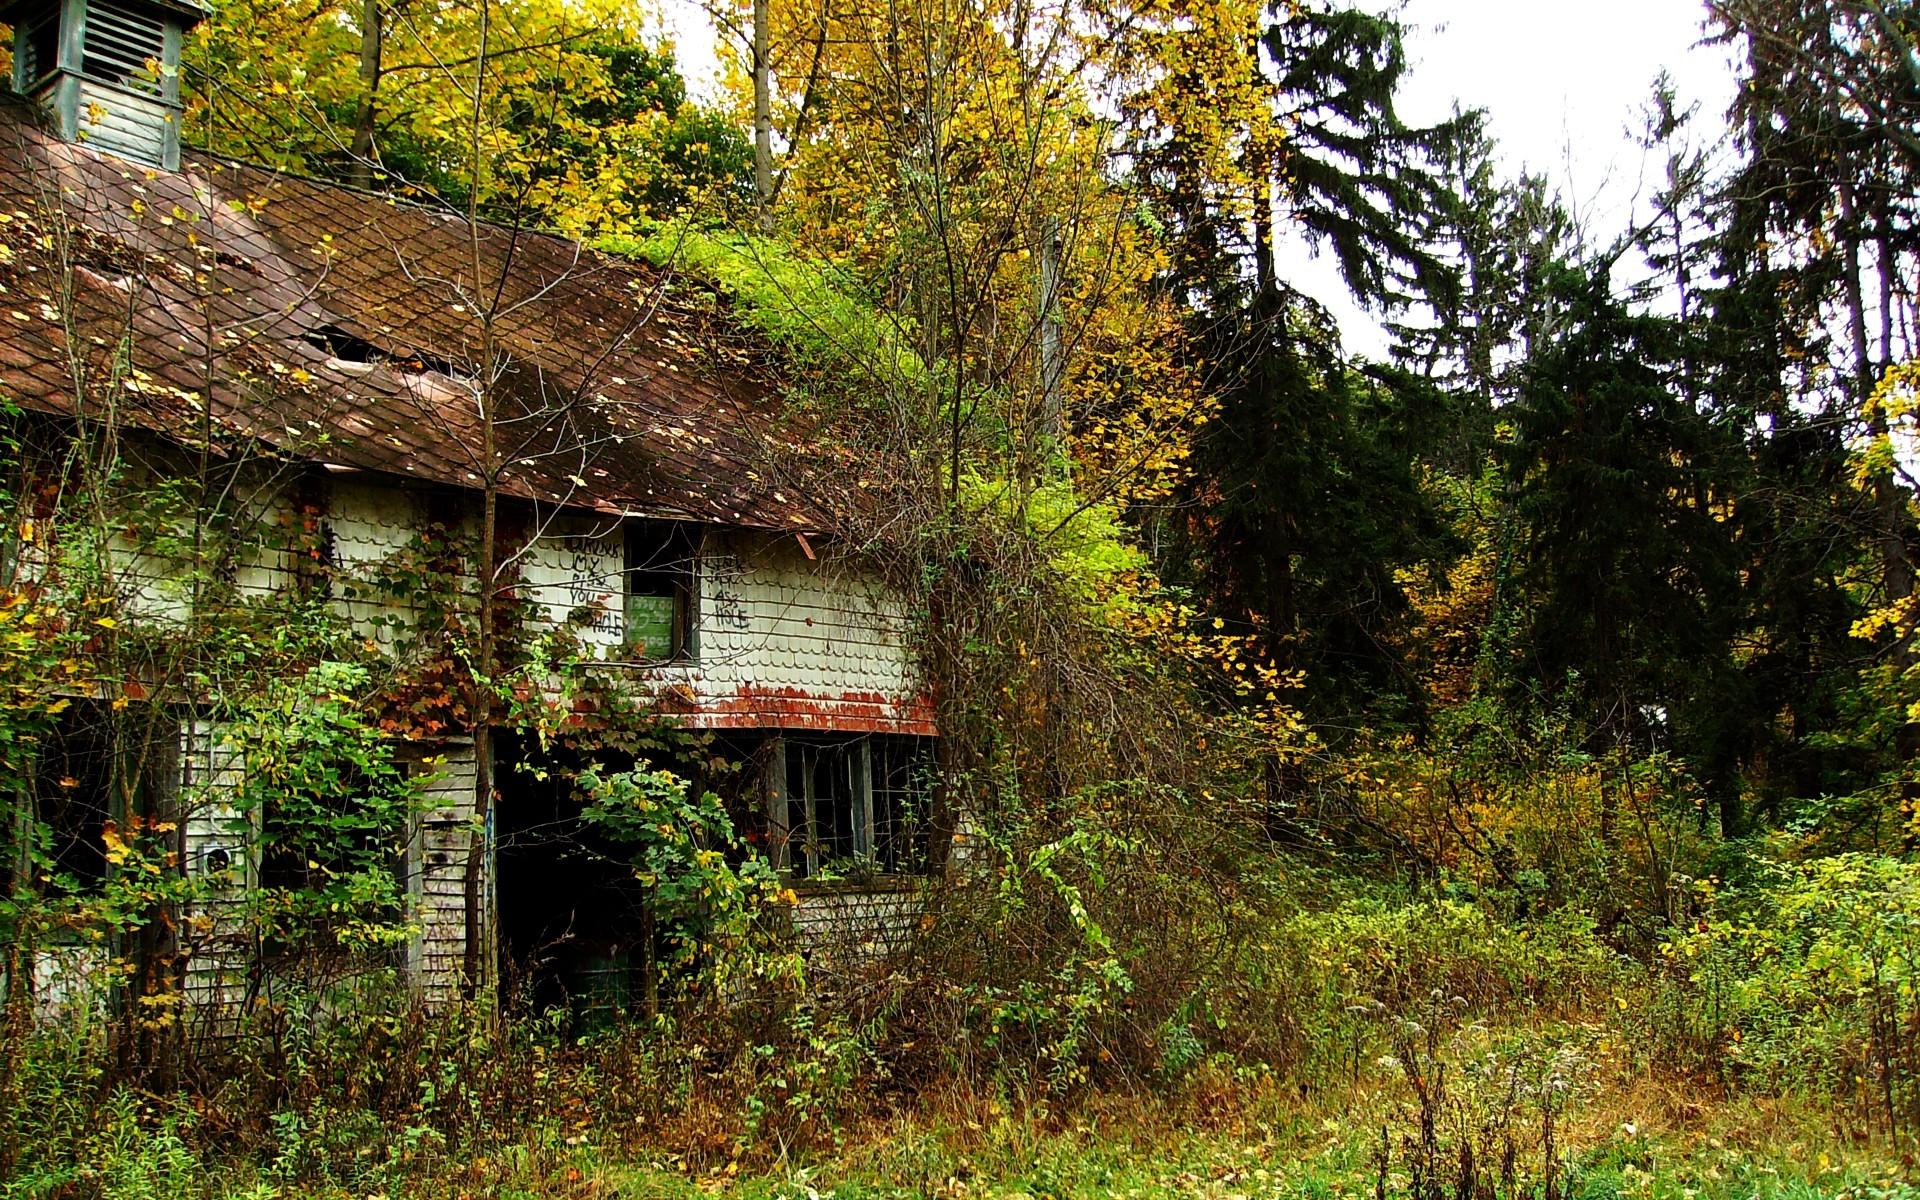 Wallpaper : forest, garden, nature, ruin, abandoned, house, green ...